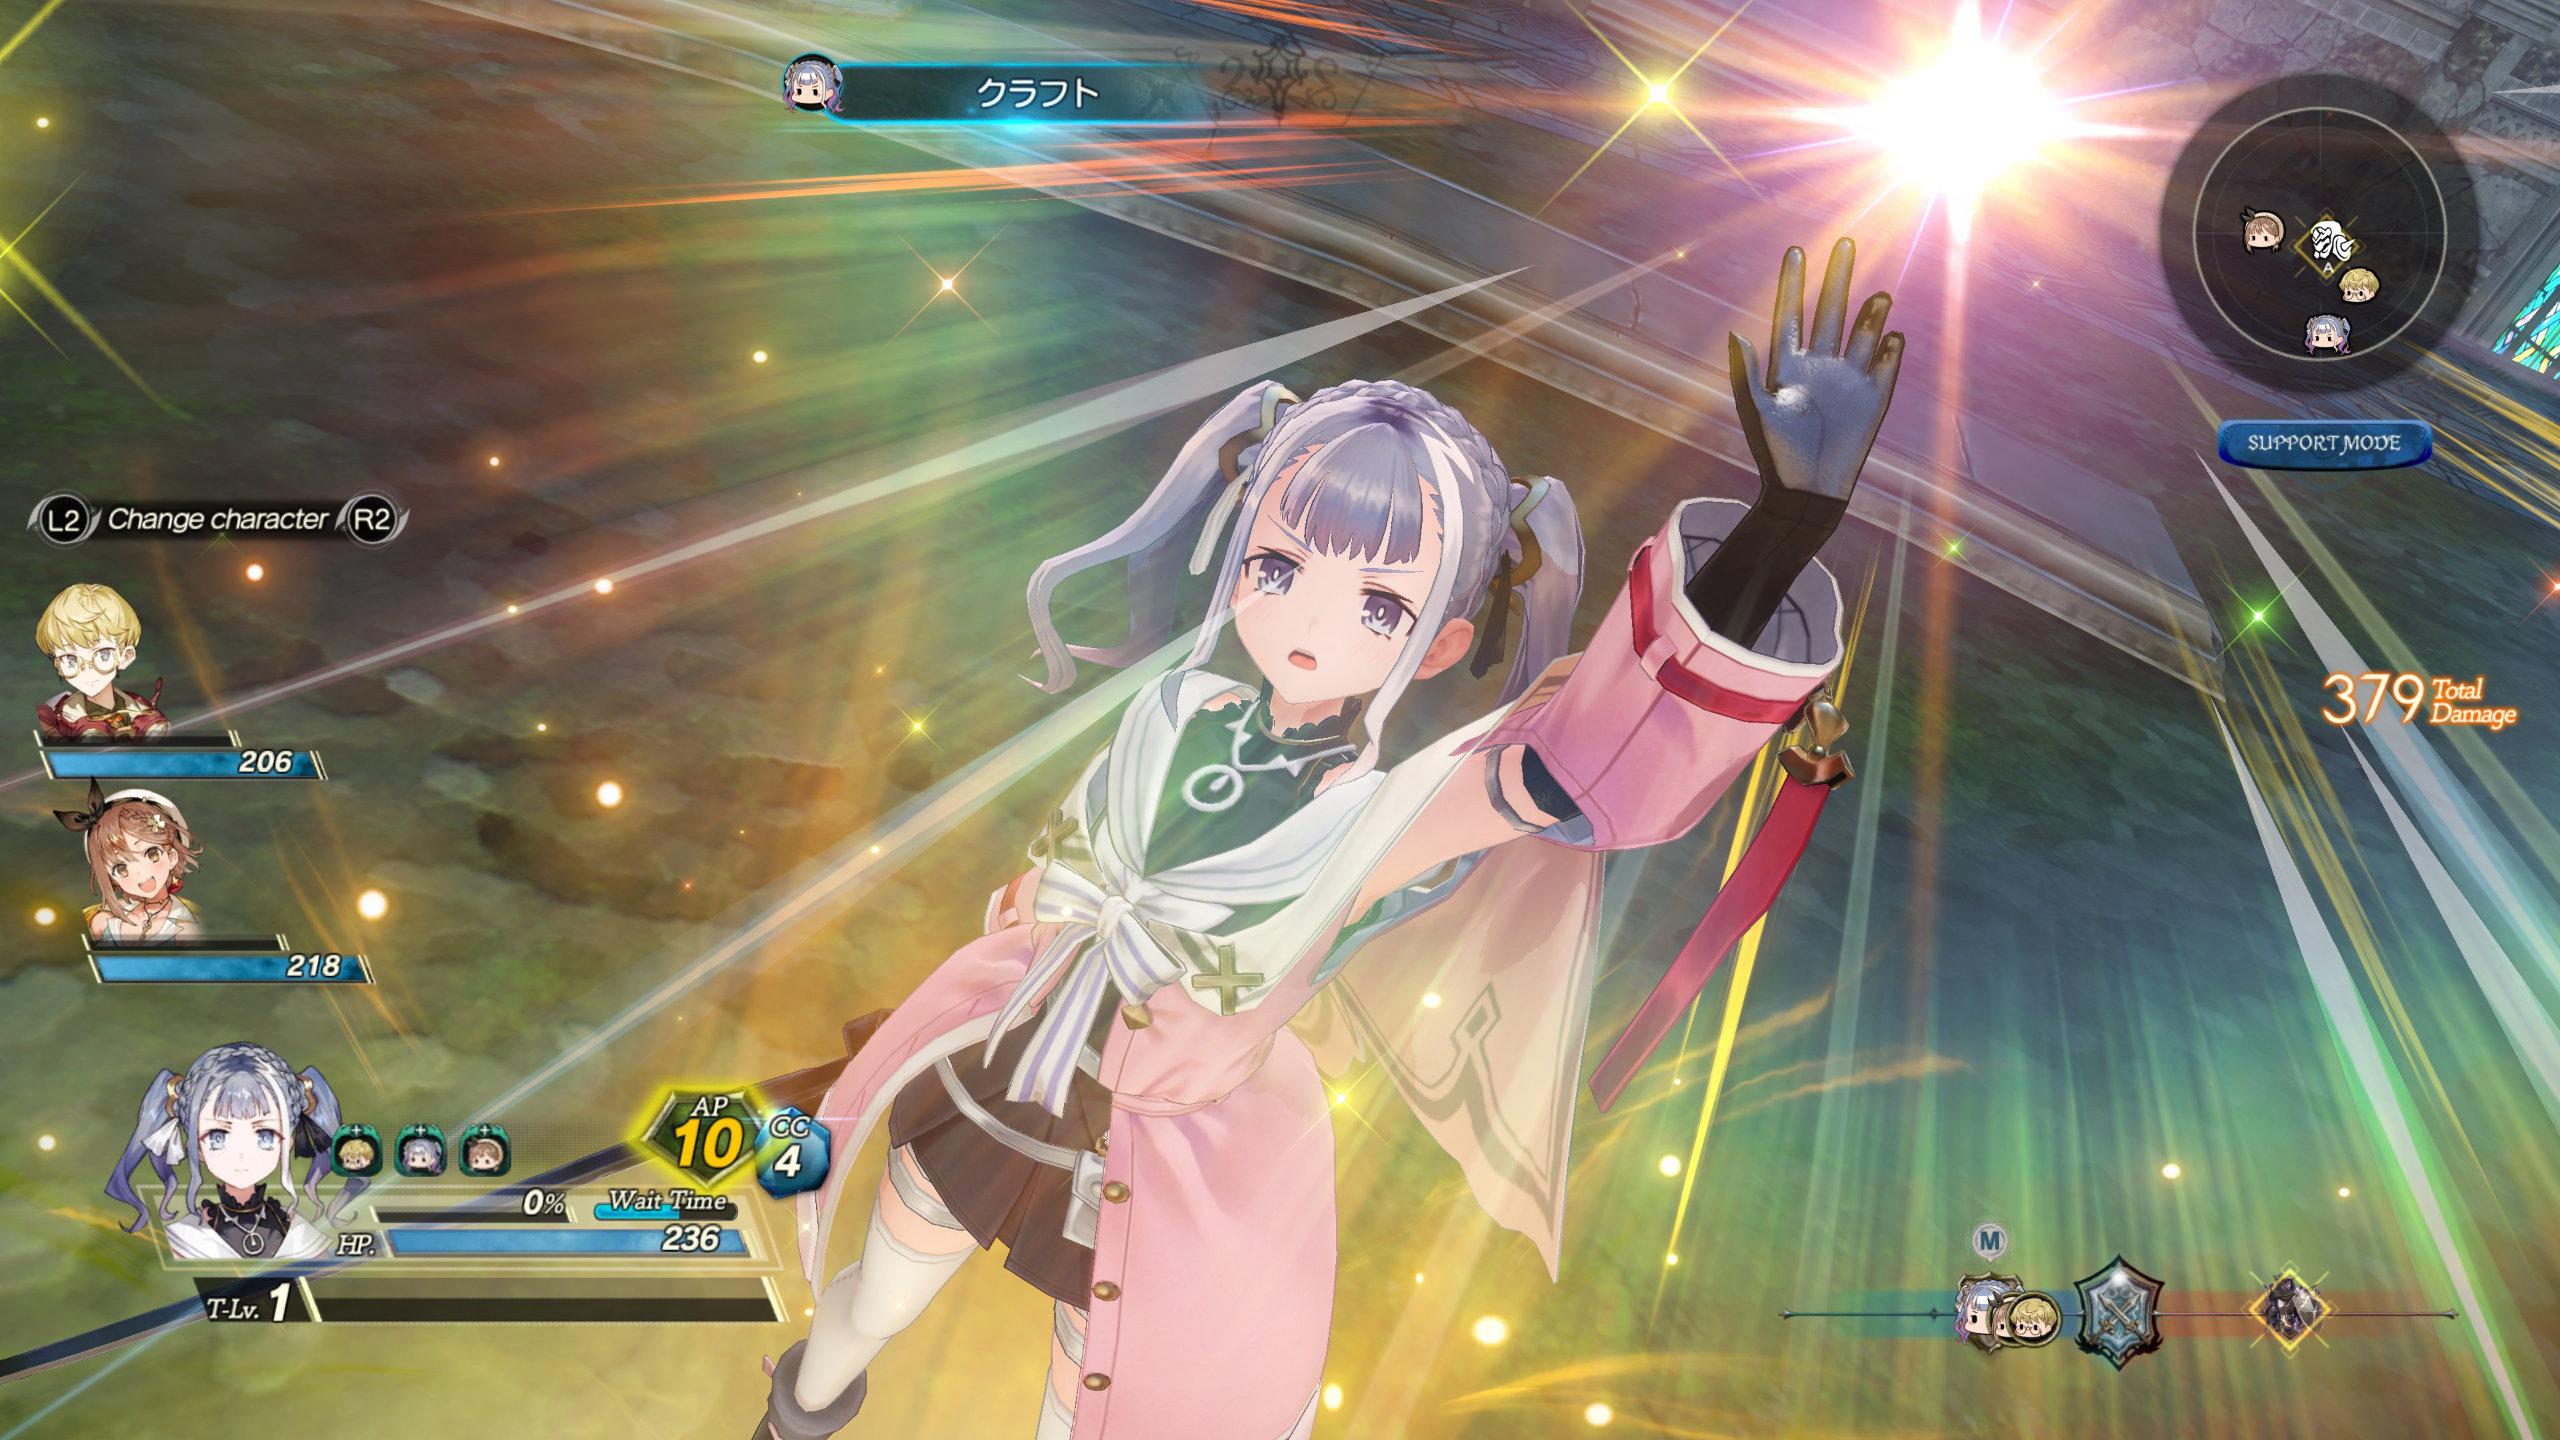 Screenshot From Atelier Ryza 2